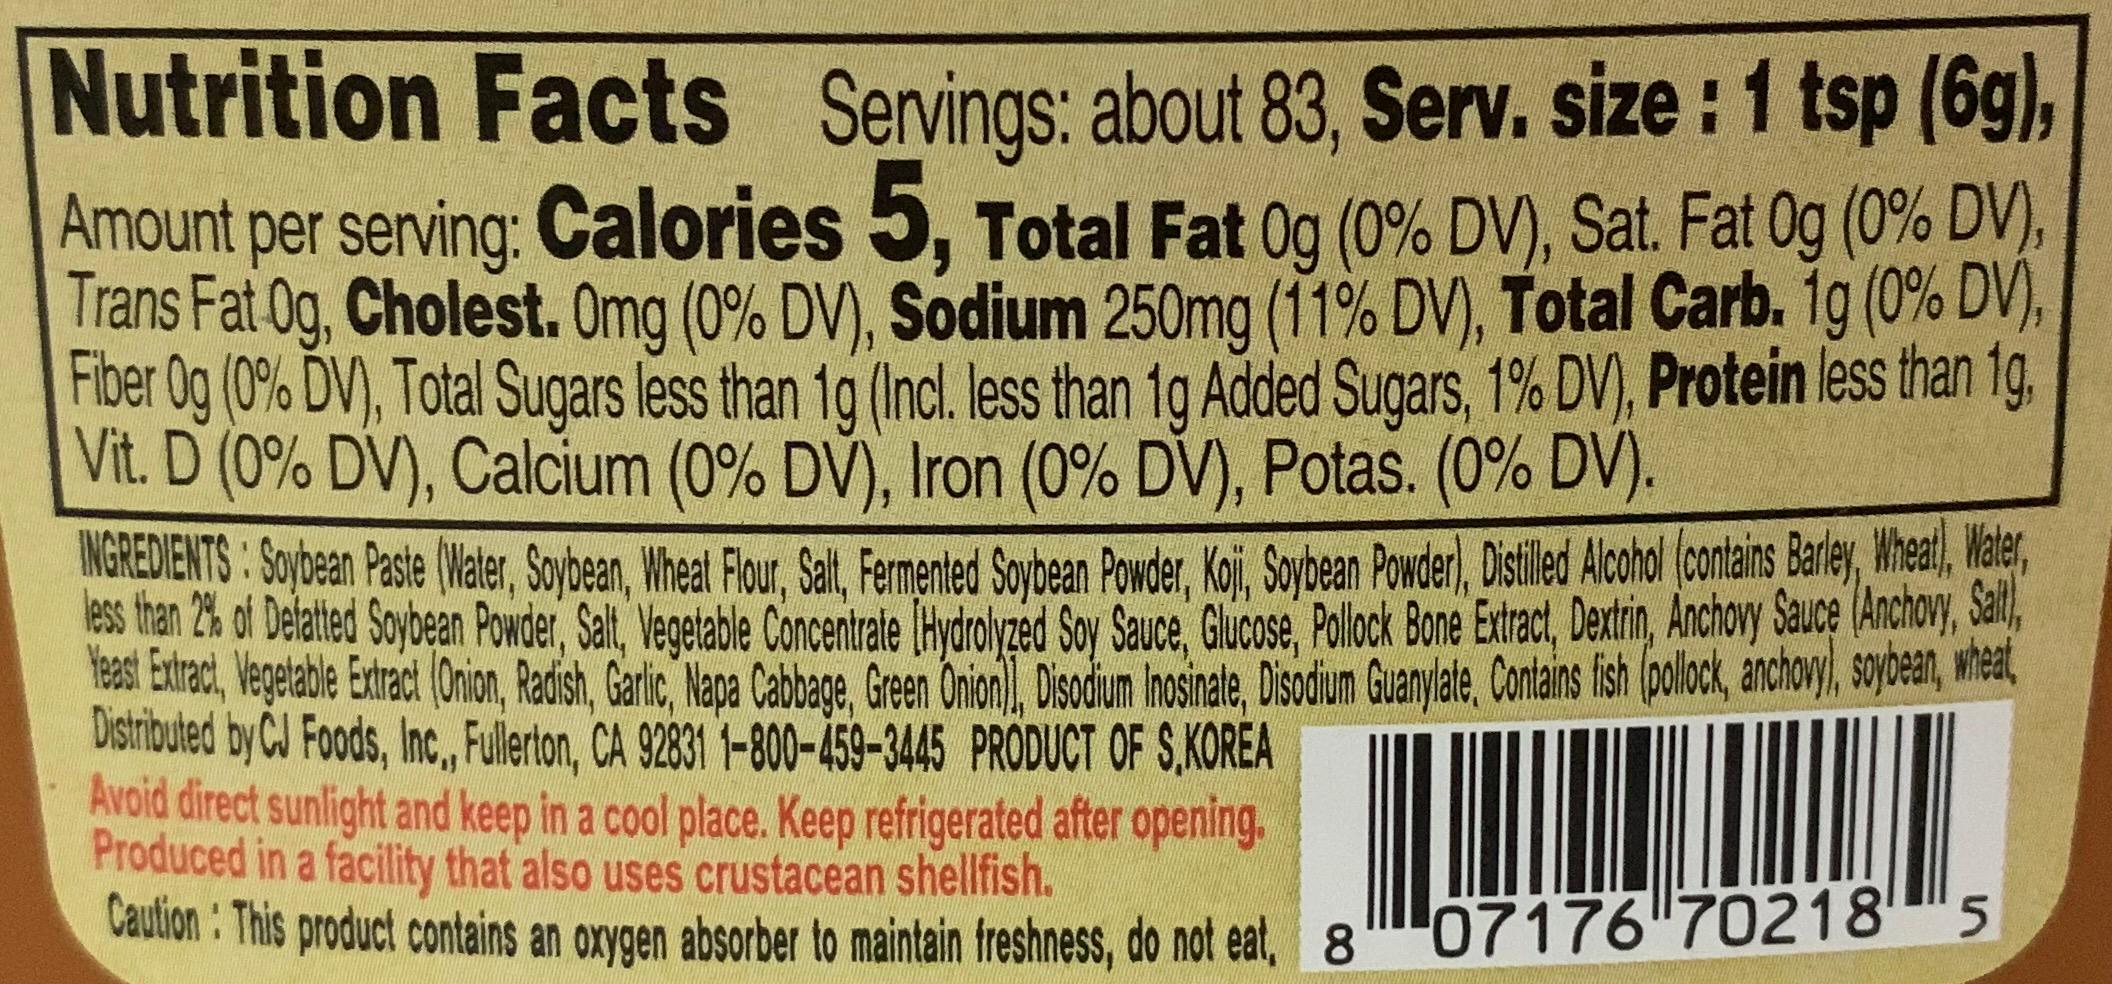 Haechandle Doenjang (Soybean Paste) 1.1lb(500g)